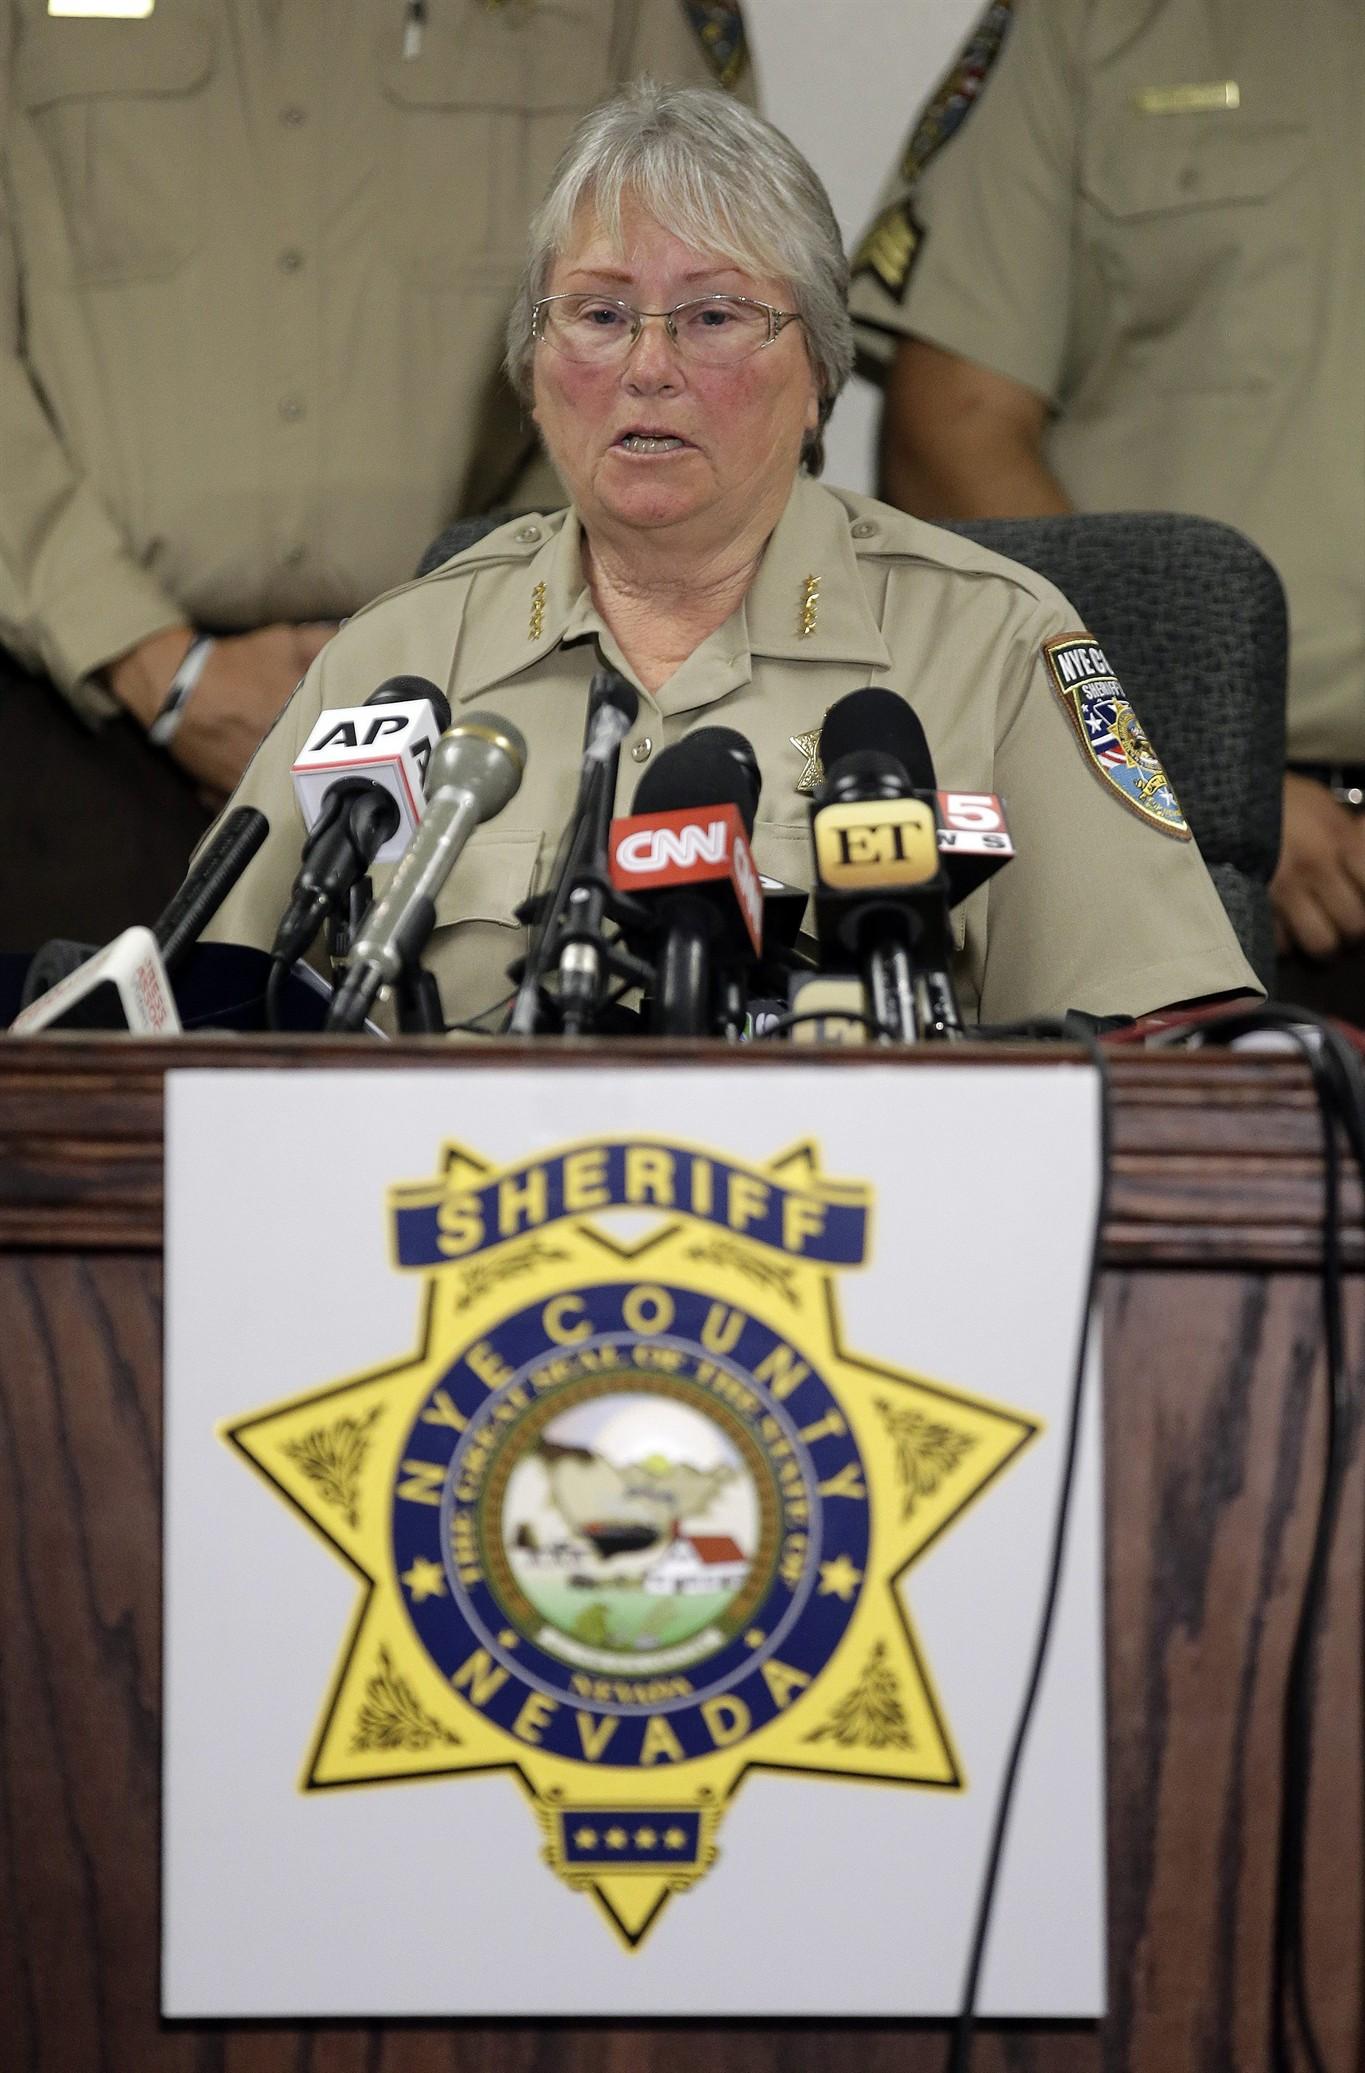 Authorities track Lamar Odom's $75,000 brothel stay